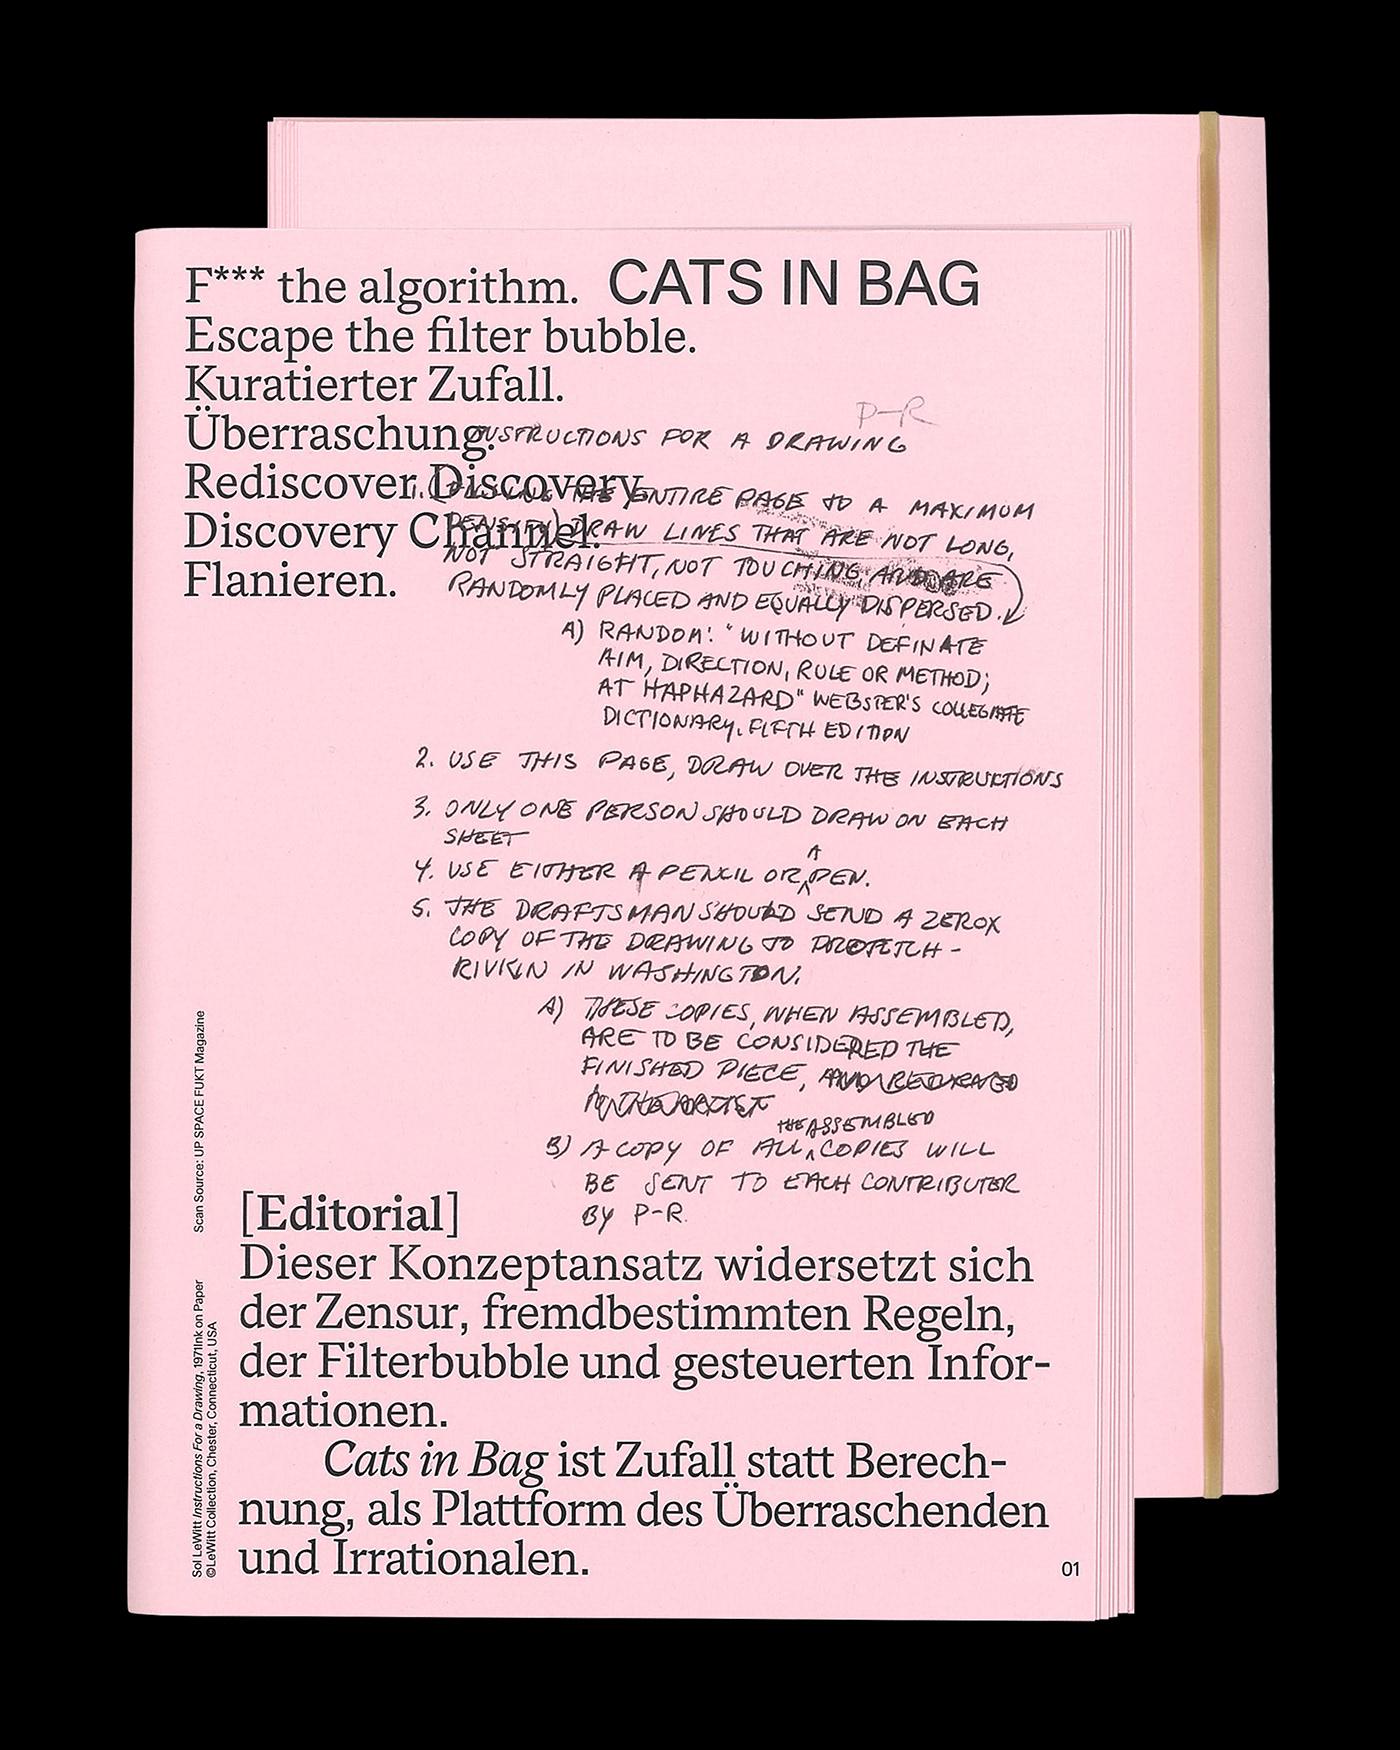 editorialdesign design art book graphicdesign typography   editorial culture trends magazine